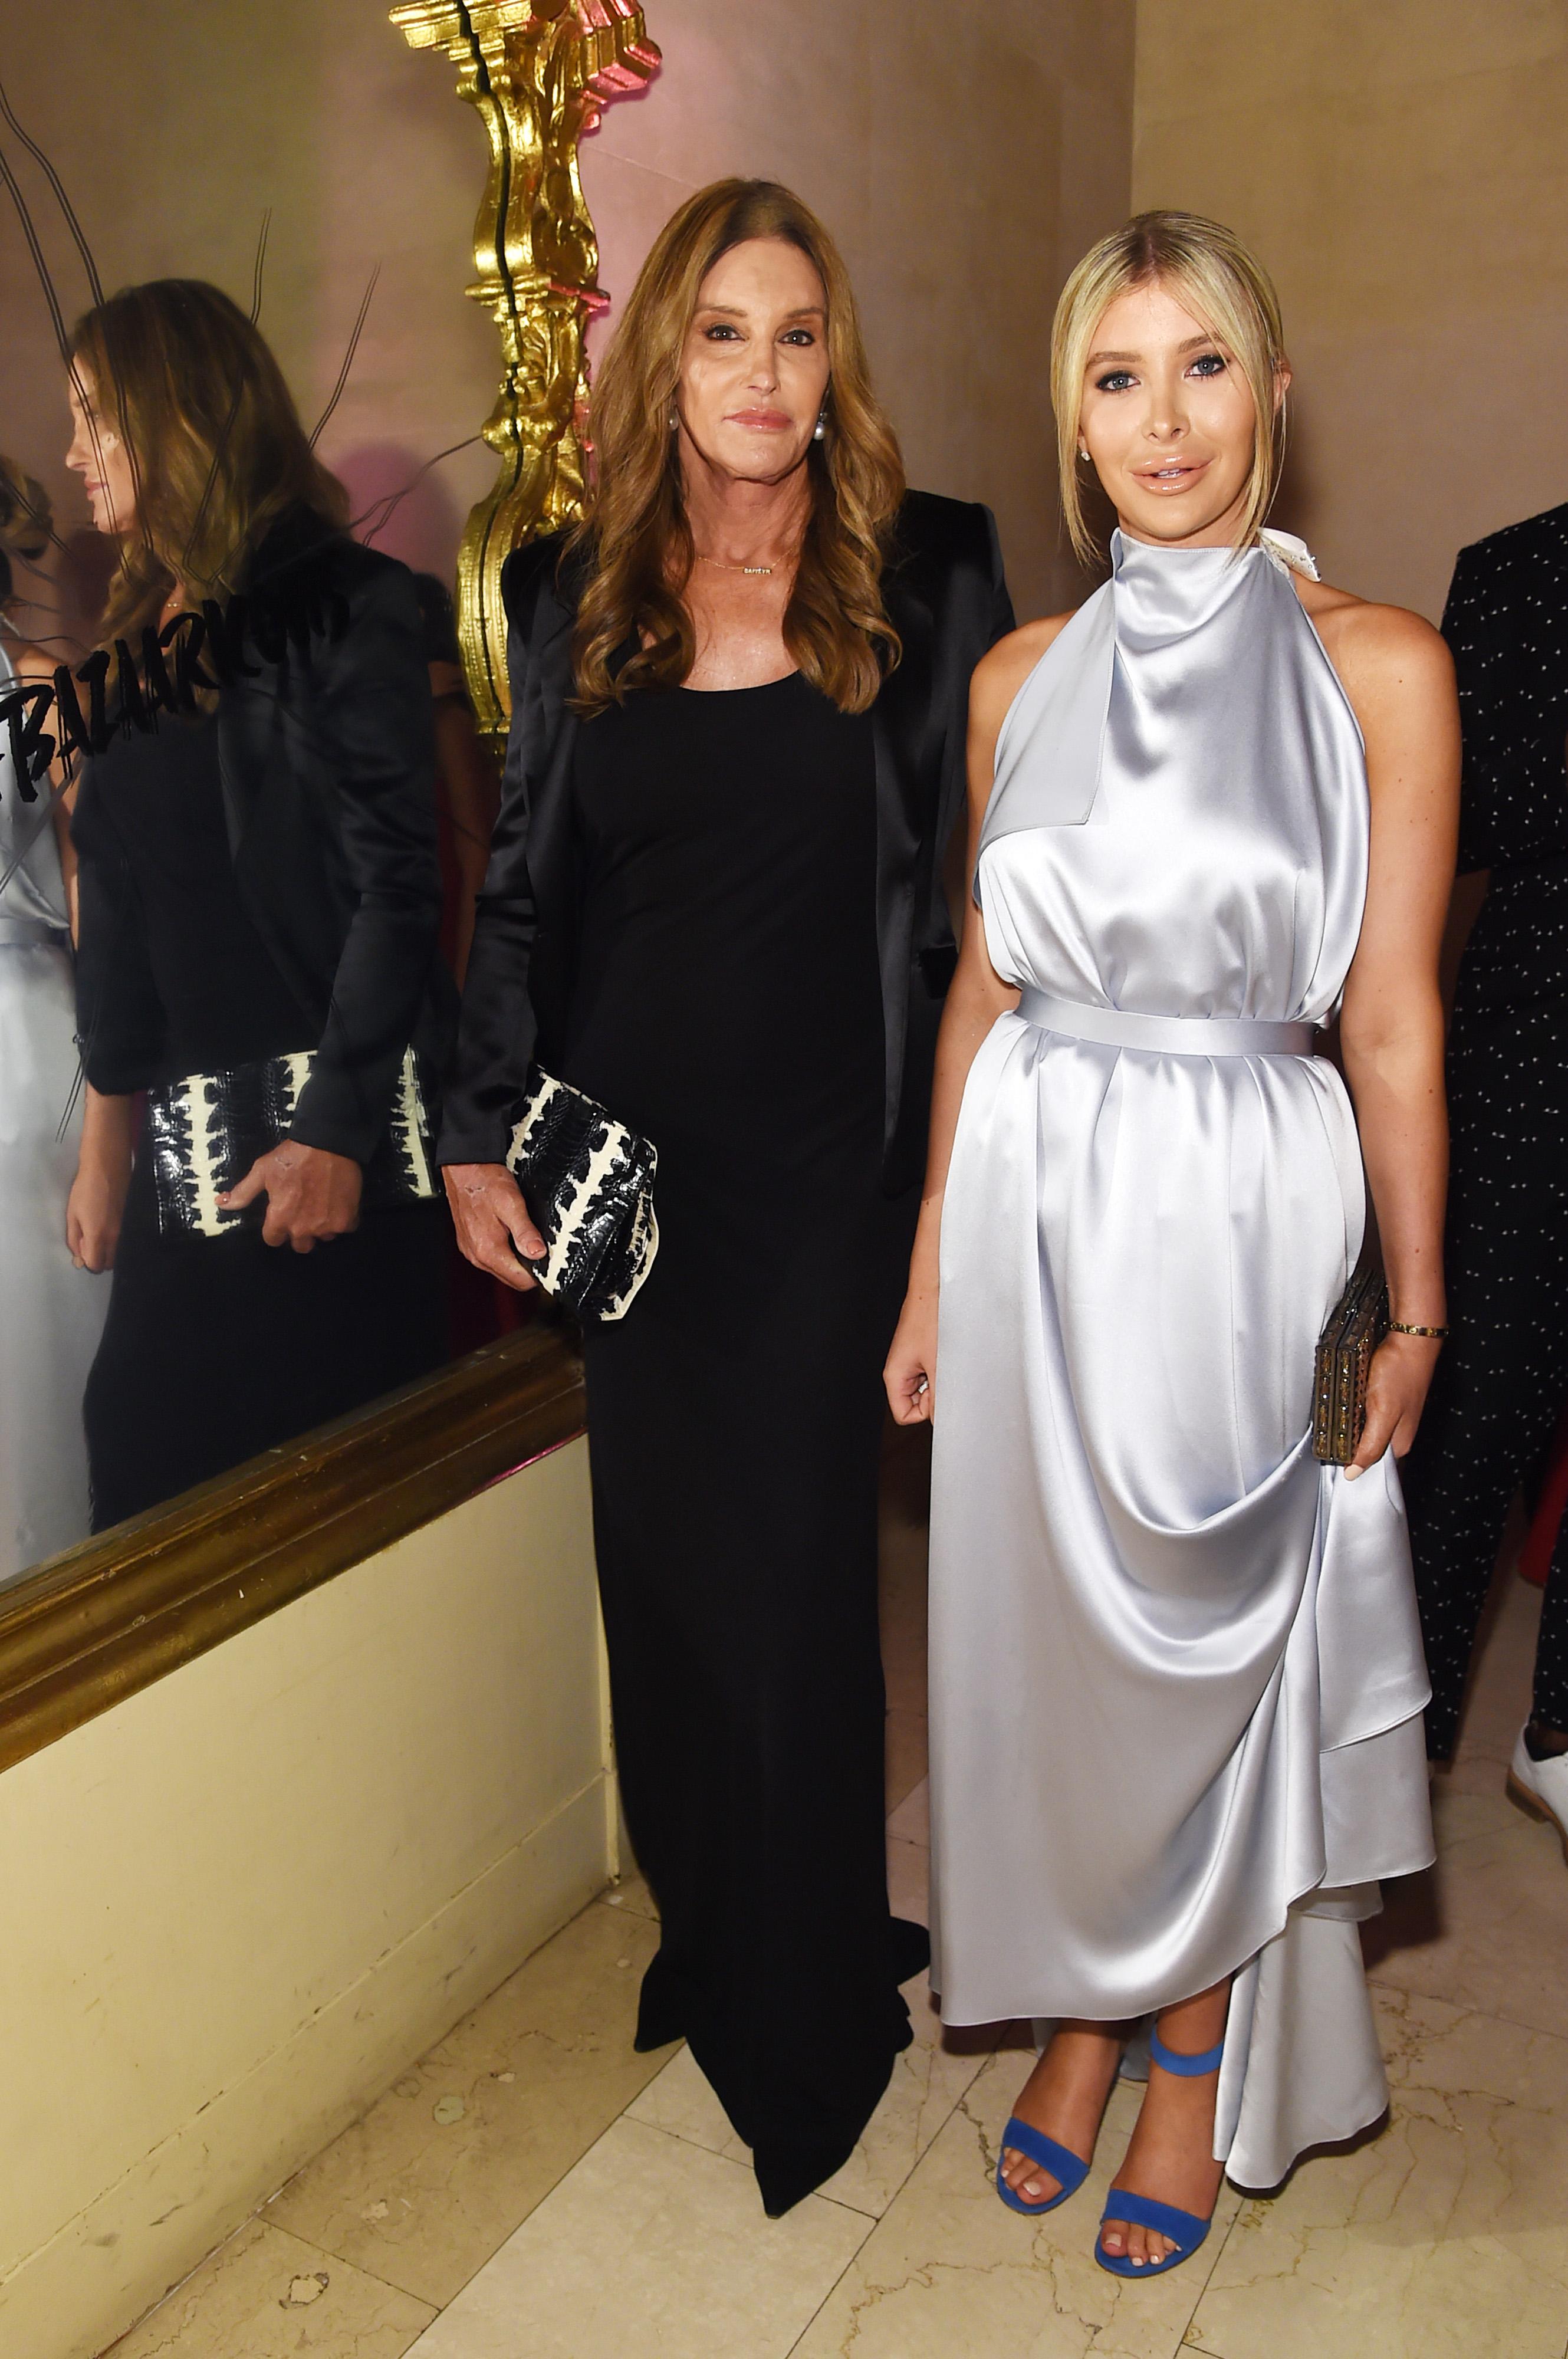 Image result for Caitlyn Jenner Sophia Hutchins